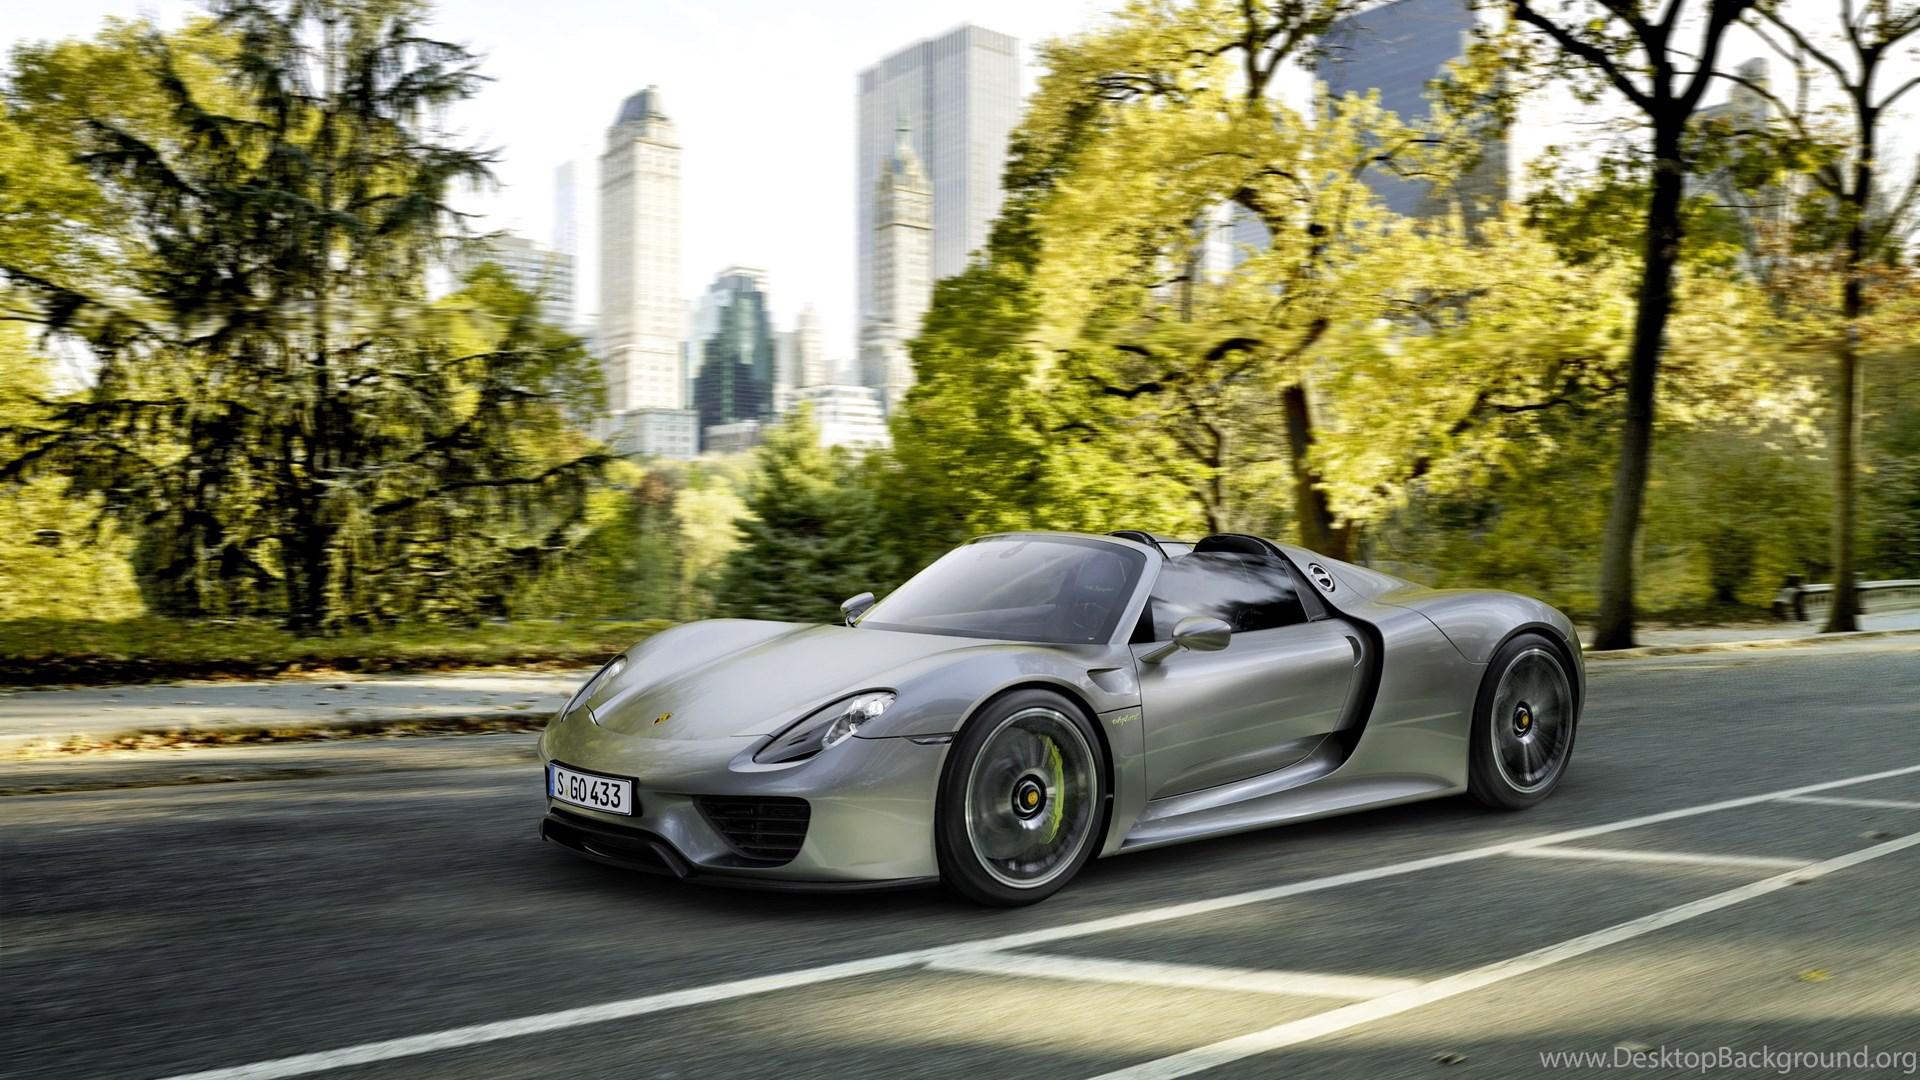 Porsche 918 Spyder High Resolution Wallpapers Image Gallery